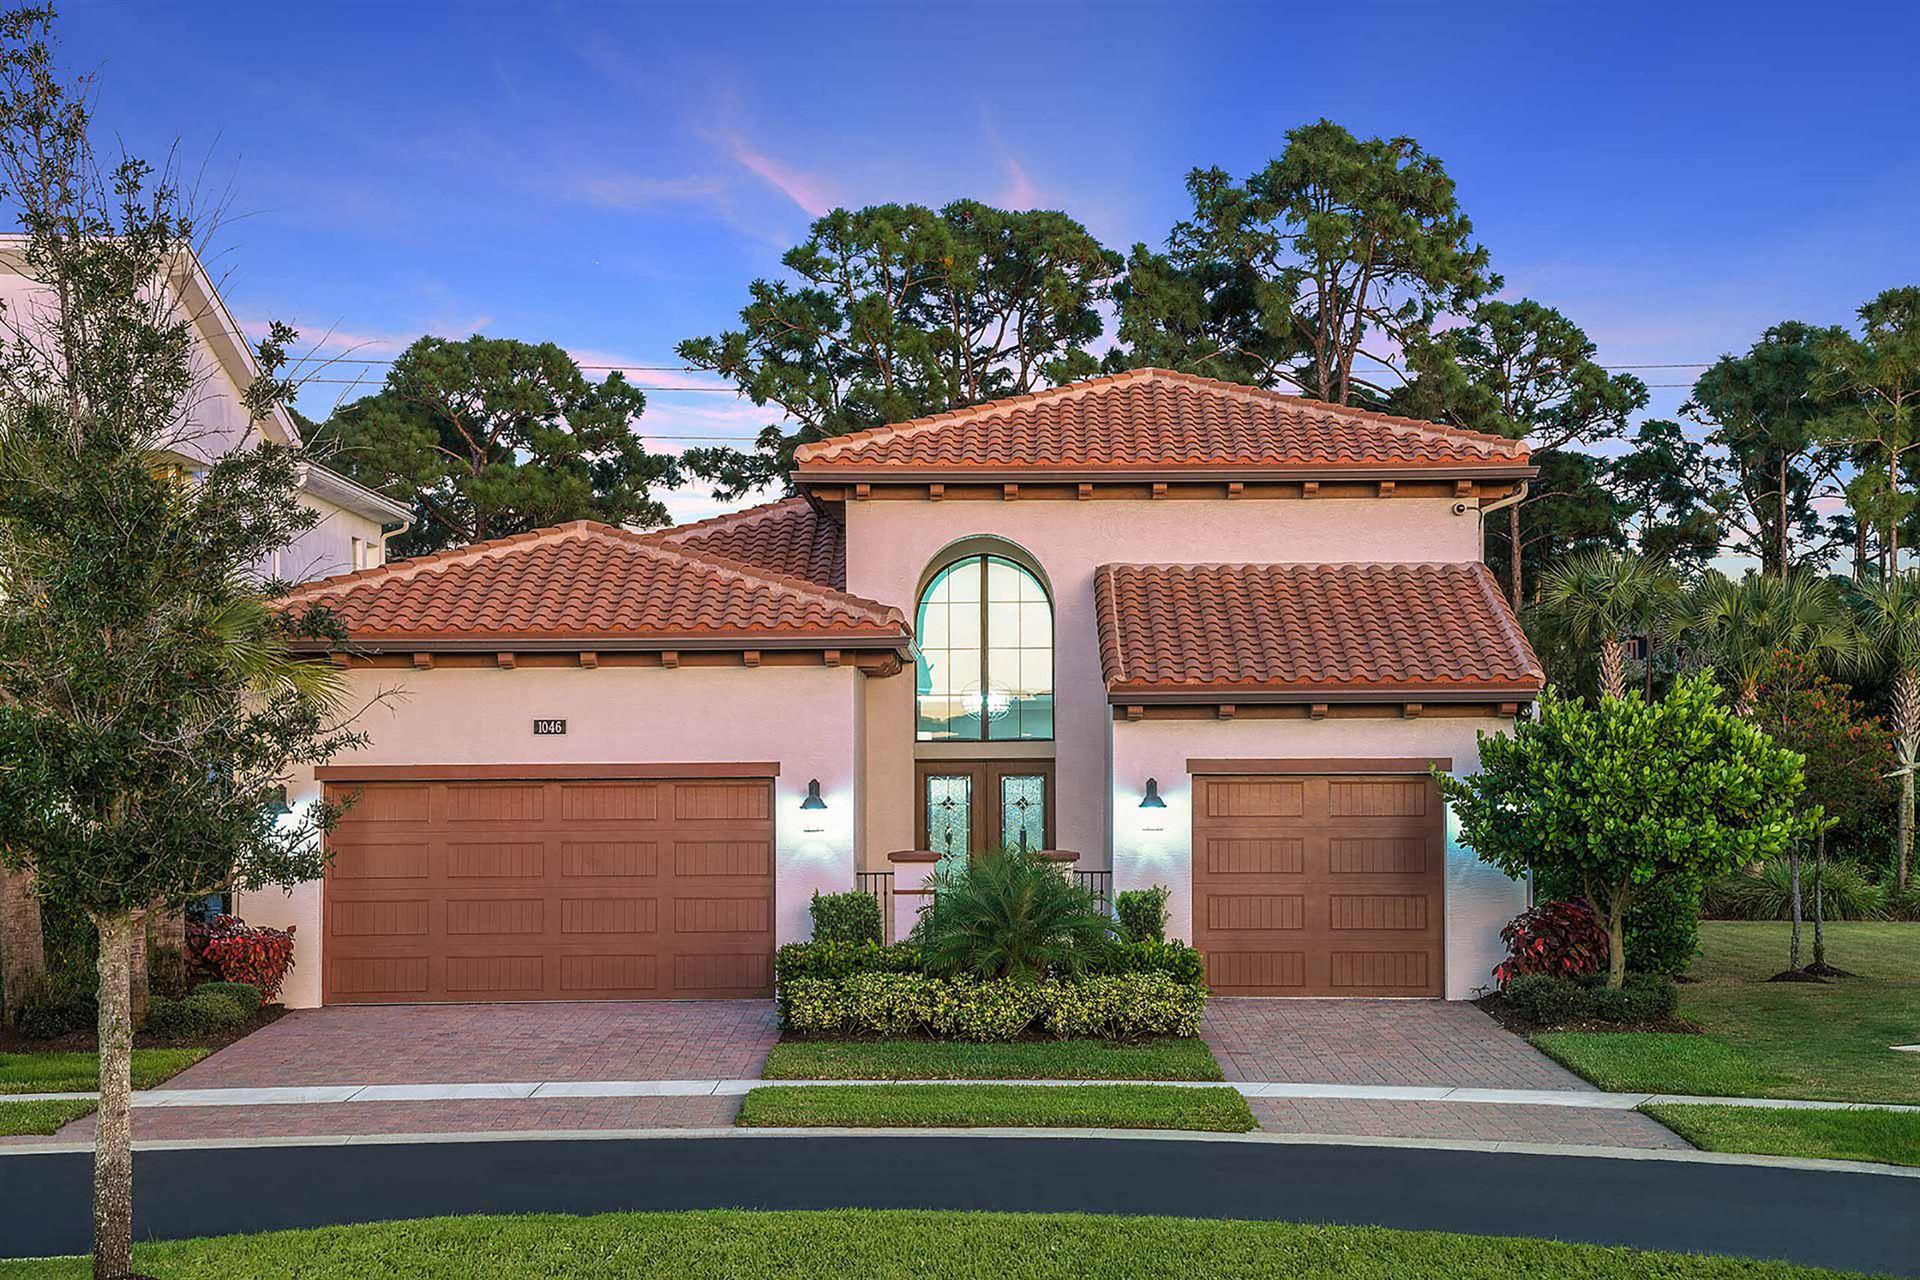 Photo of 1046 Faulkner Terrace, Palm Beach Gardens, FL 33418 (MLS # RX-10708405)